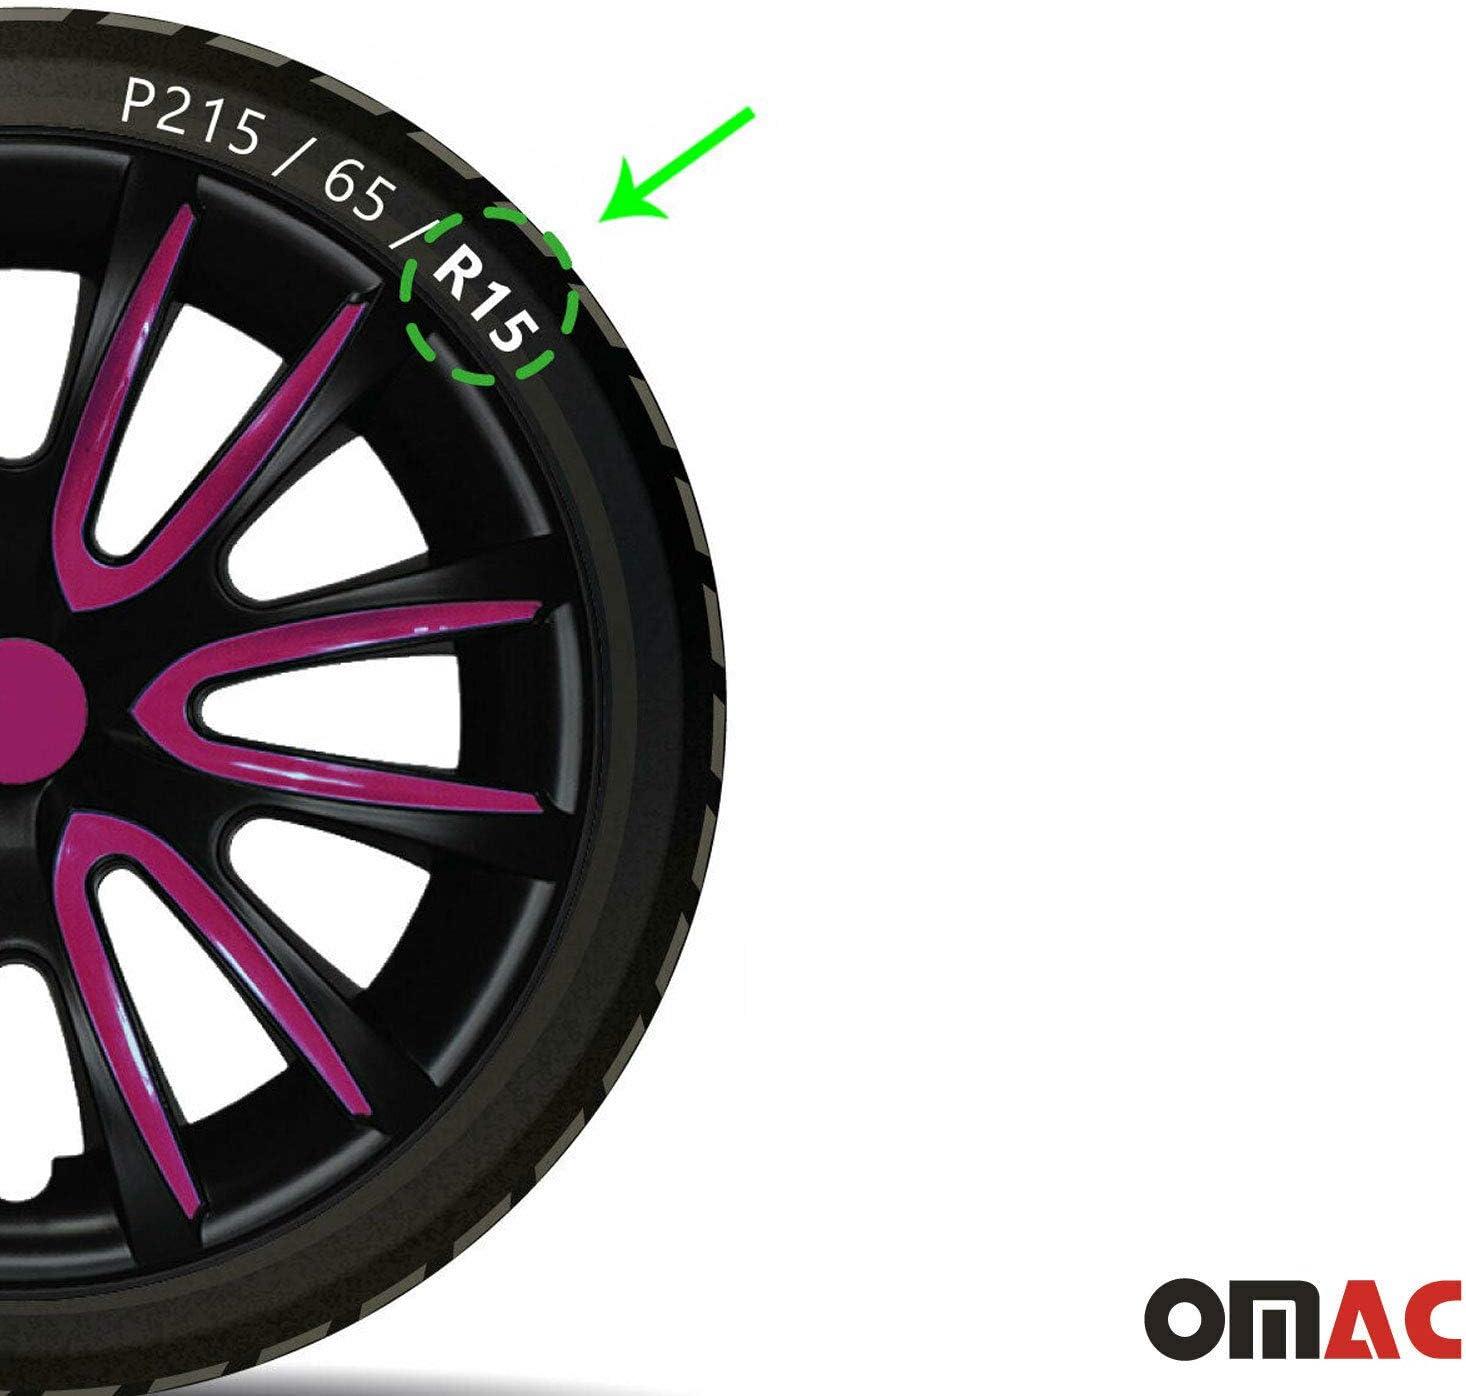 OMAC GmbH Wheel Trims 15 Inch Steel Rims Matt Black Purple Set of 4